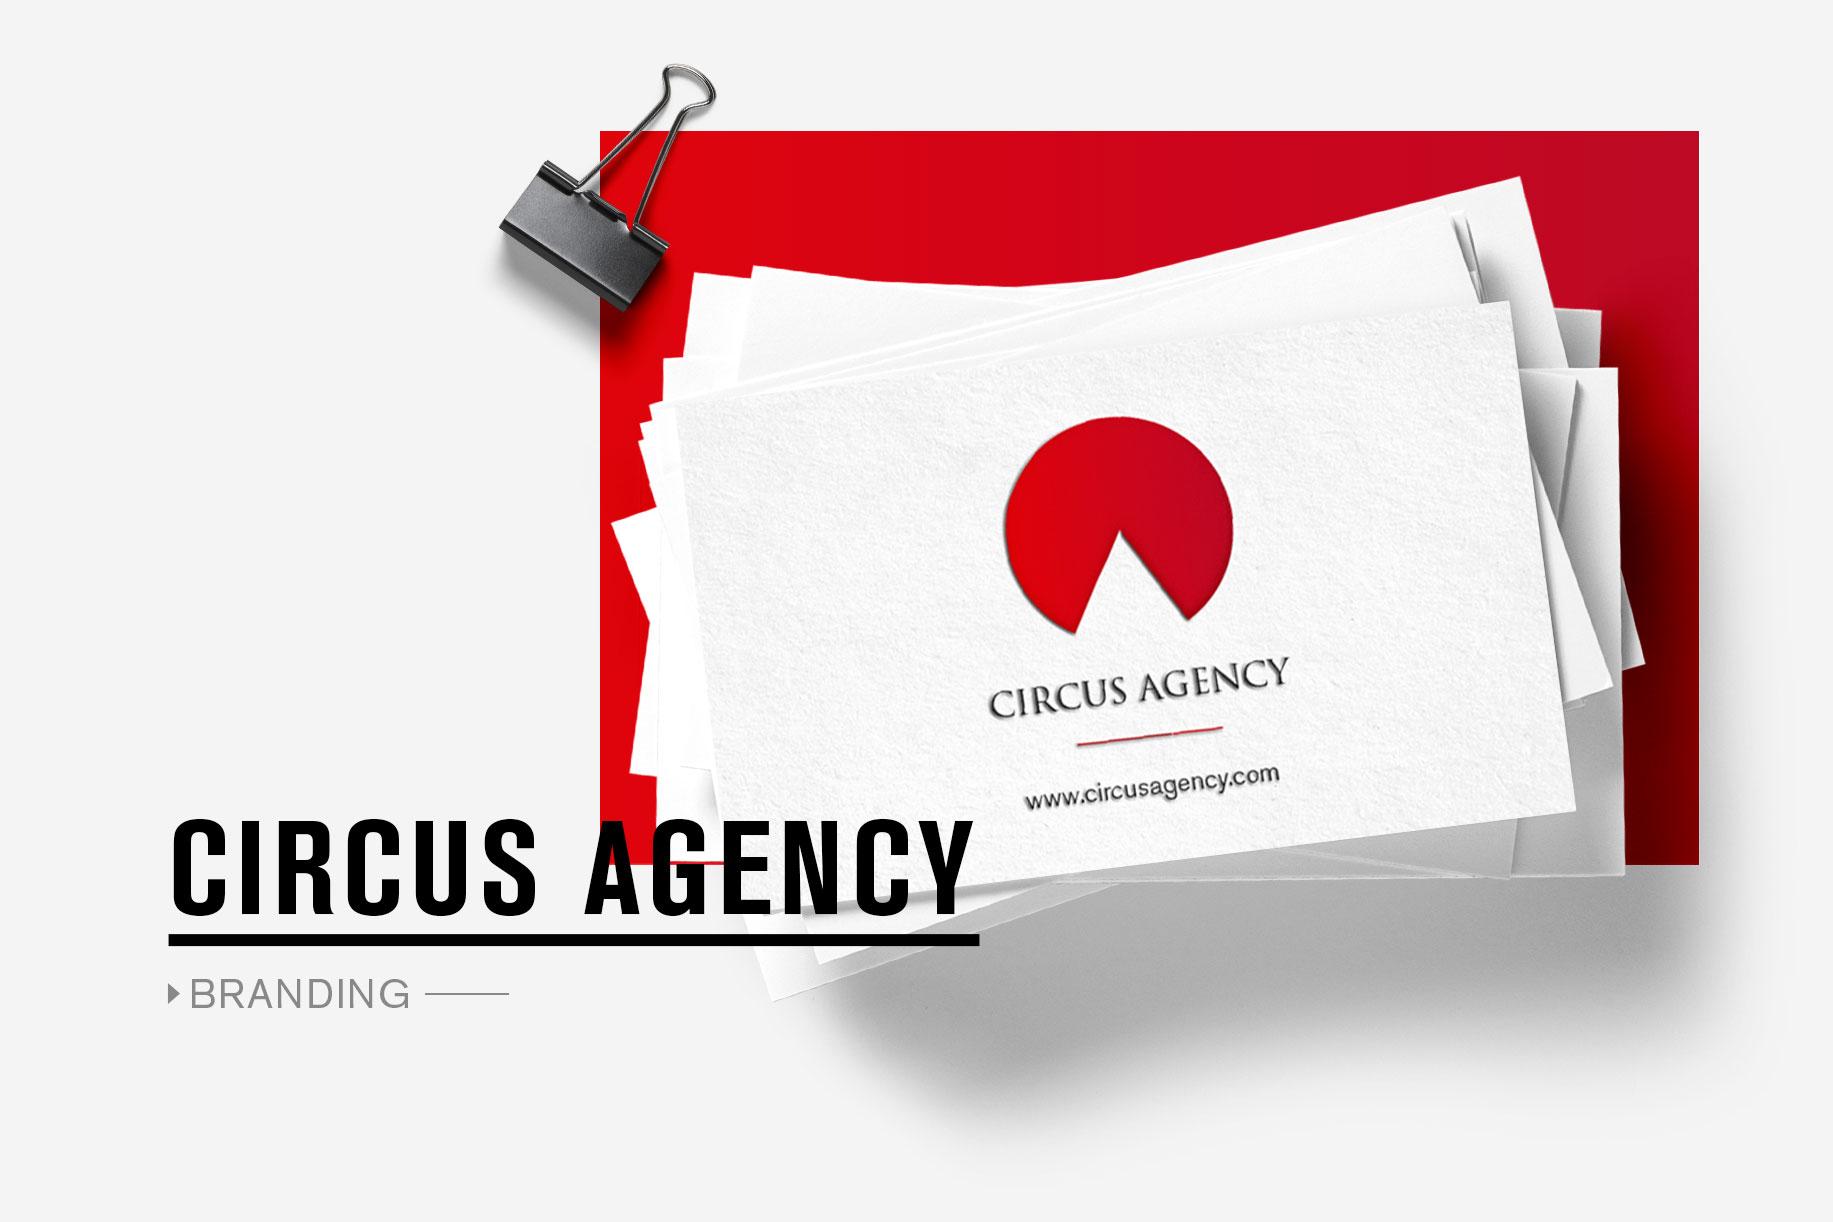 CIRCUS AGENCY